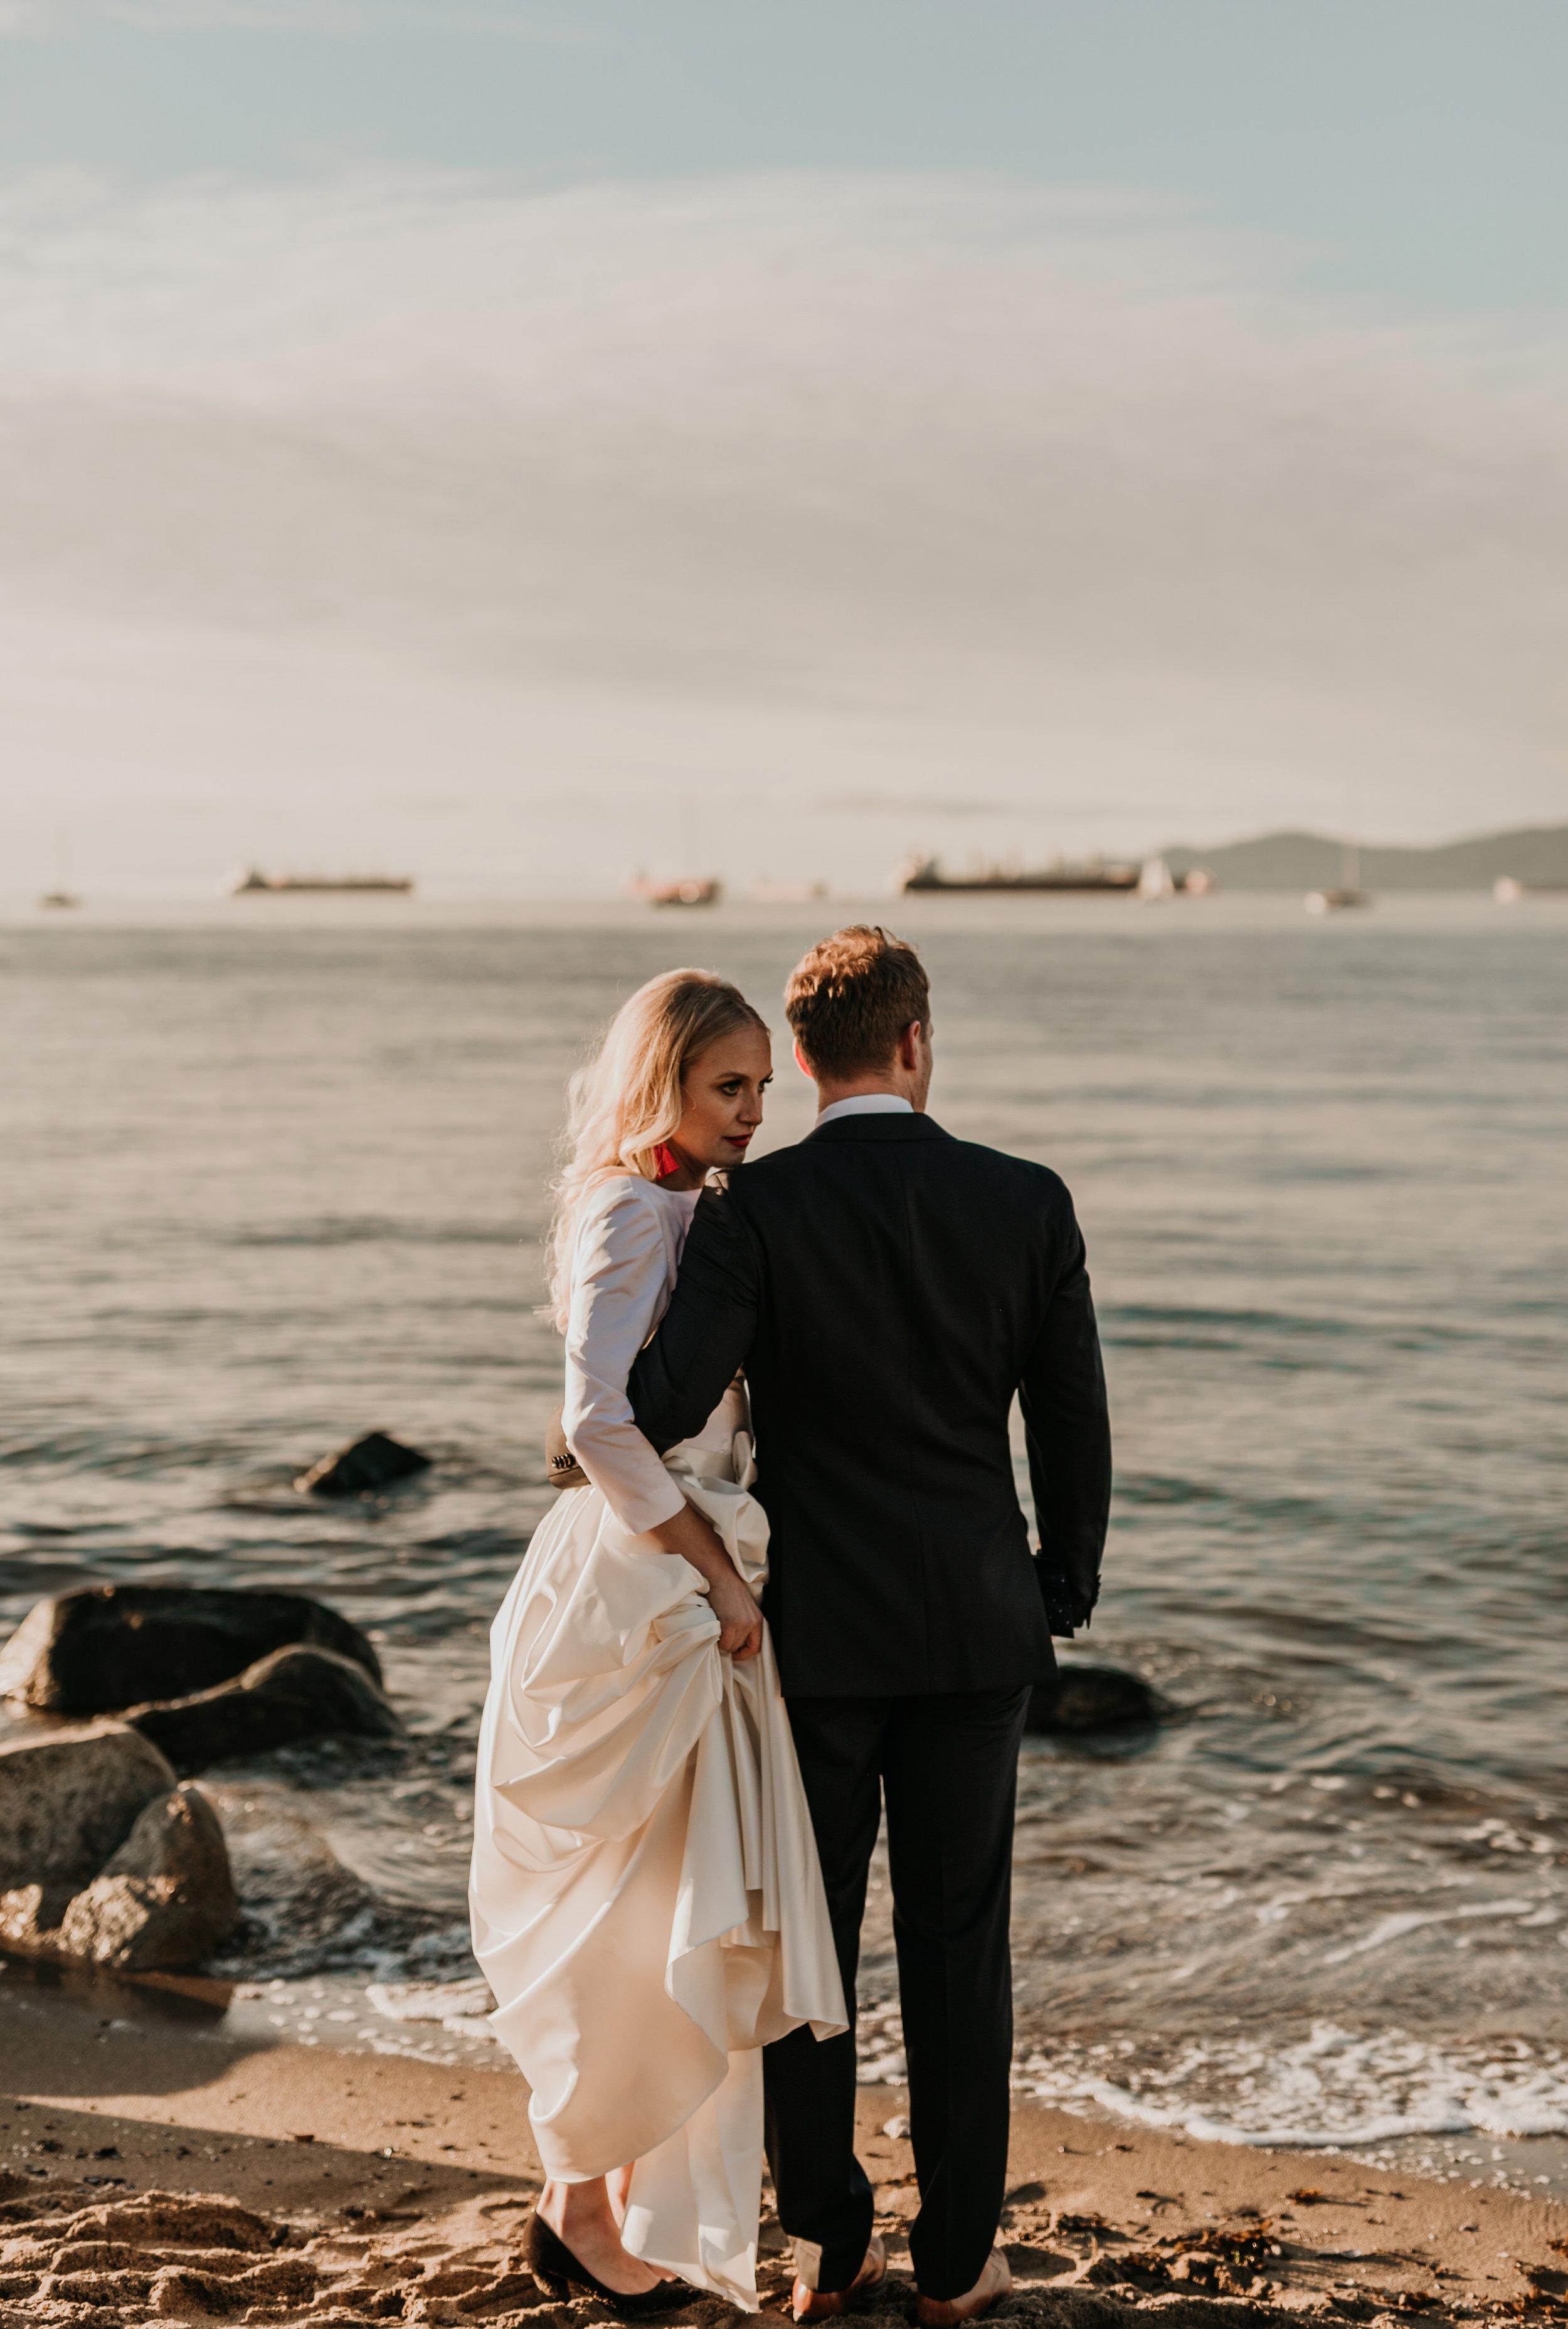 Vancouver Wedding Photos - Vegan Wedding Photographer - New Years Eve Wedding Photos - Vancouver Wedding Photographer - Vancouver Wedding Videographer - 650.JPG